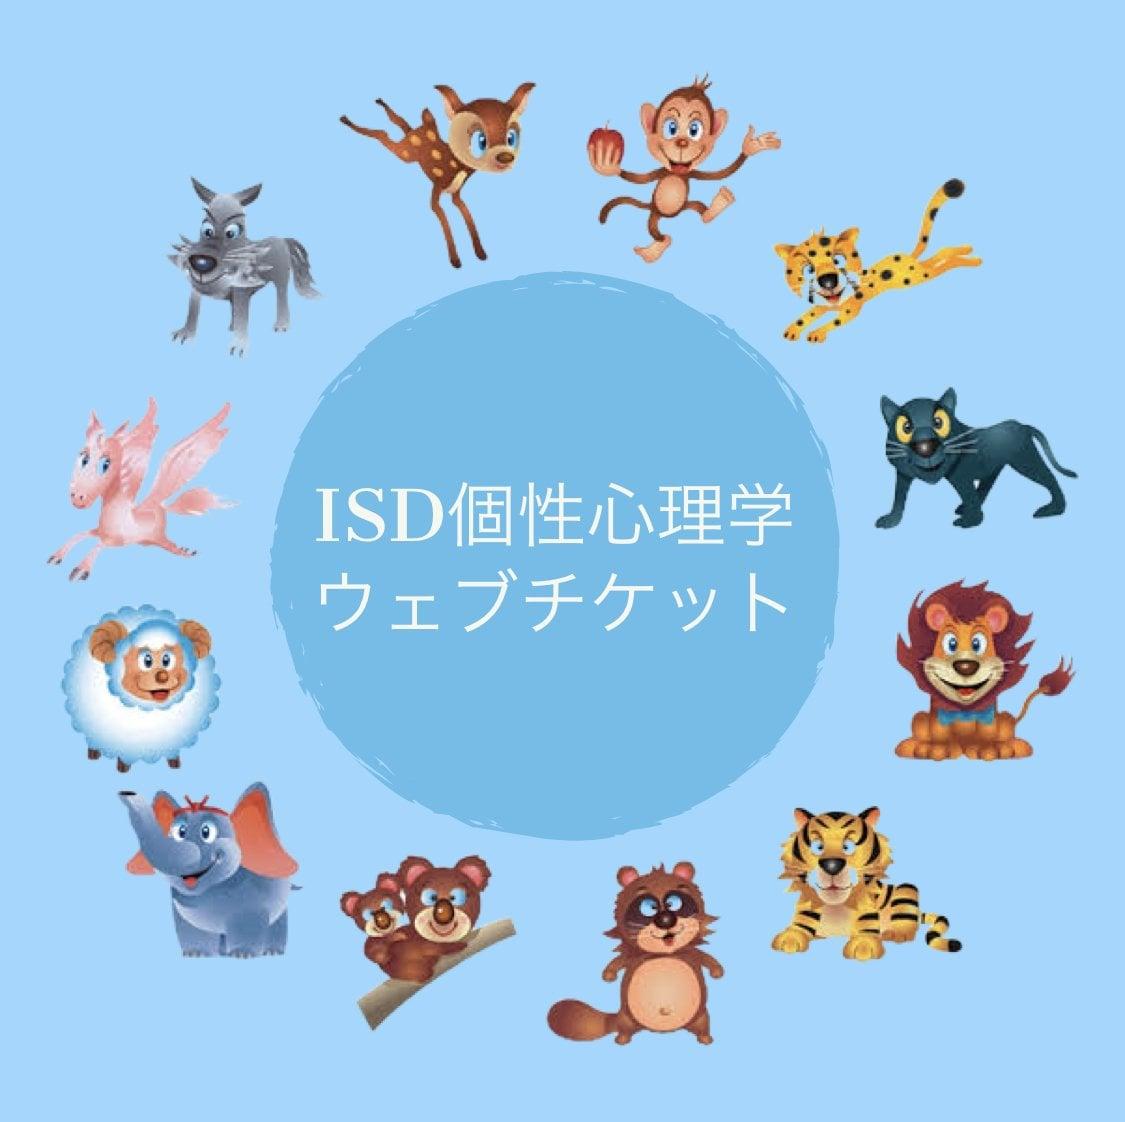 ISD個性心理学 診断書(データでお届けします)のイメージその1